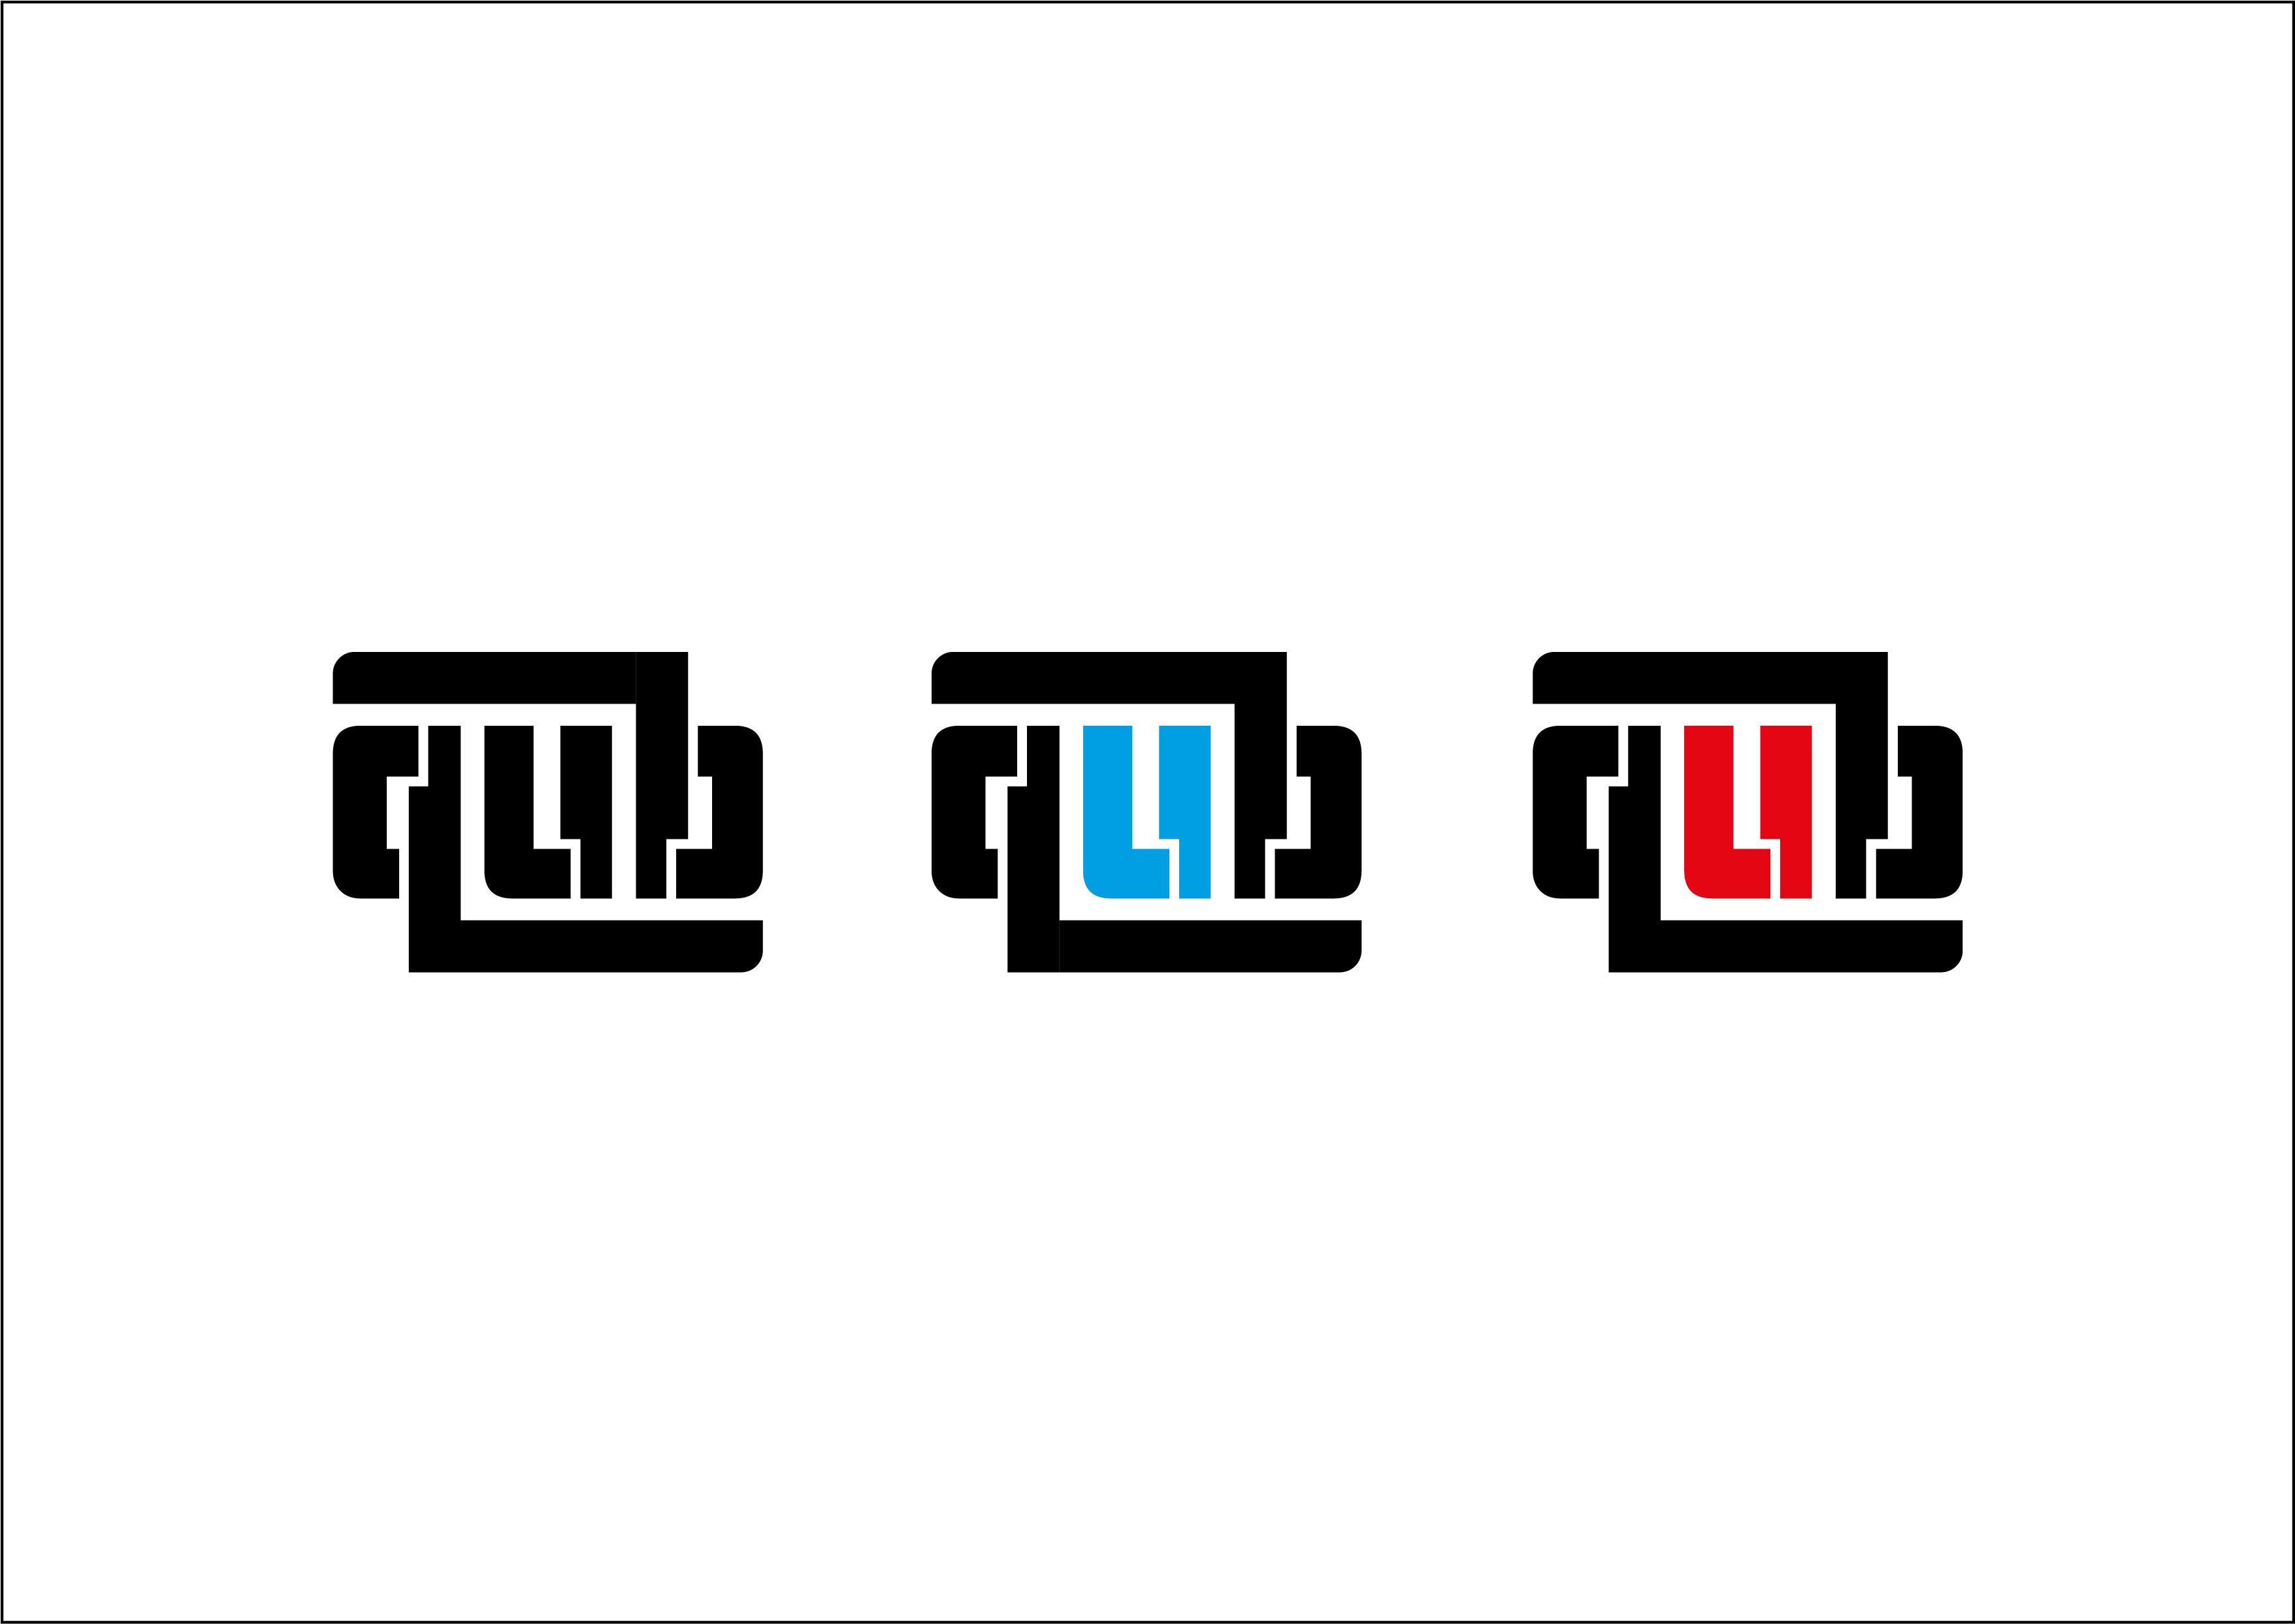 Разработка логотипа и фирменного стиля для ТМ фото f_9525f2132388c9dc.jpg